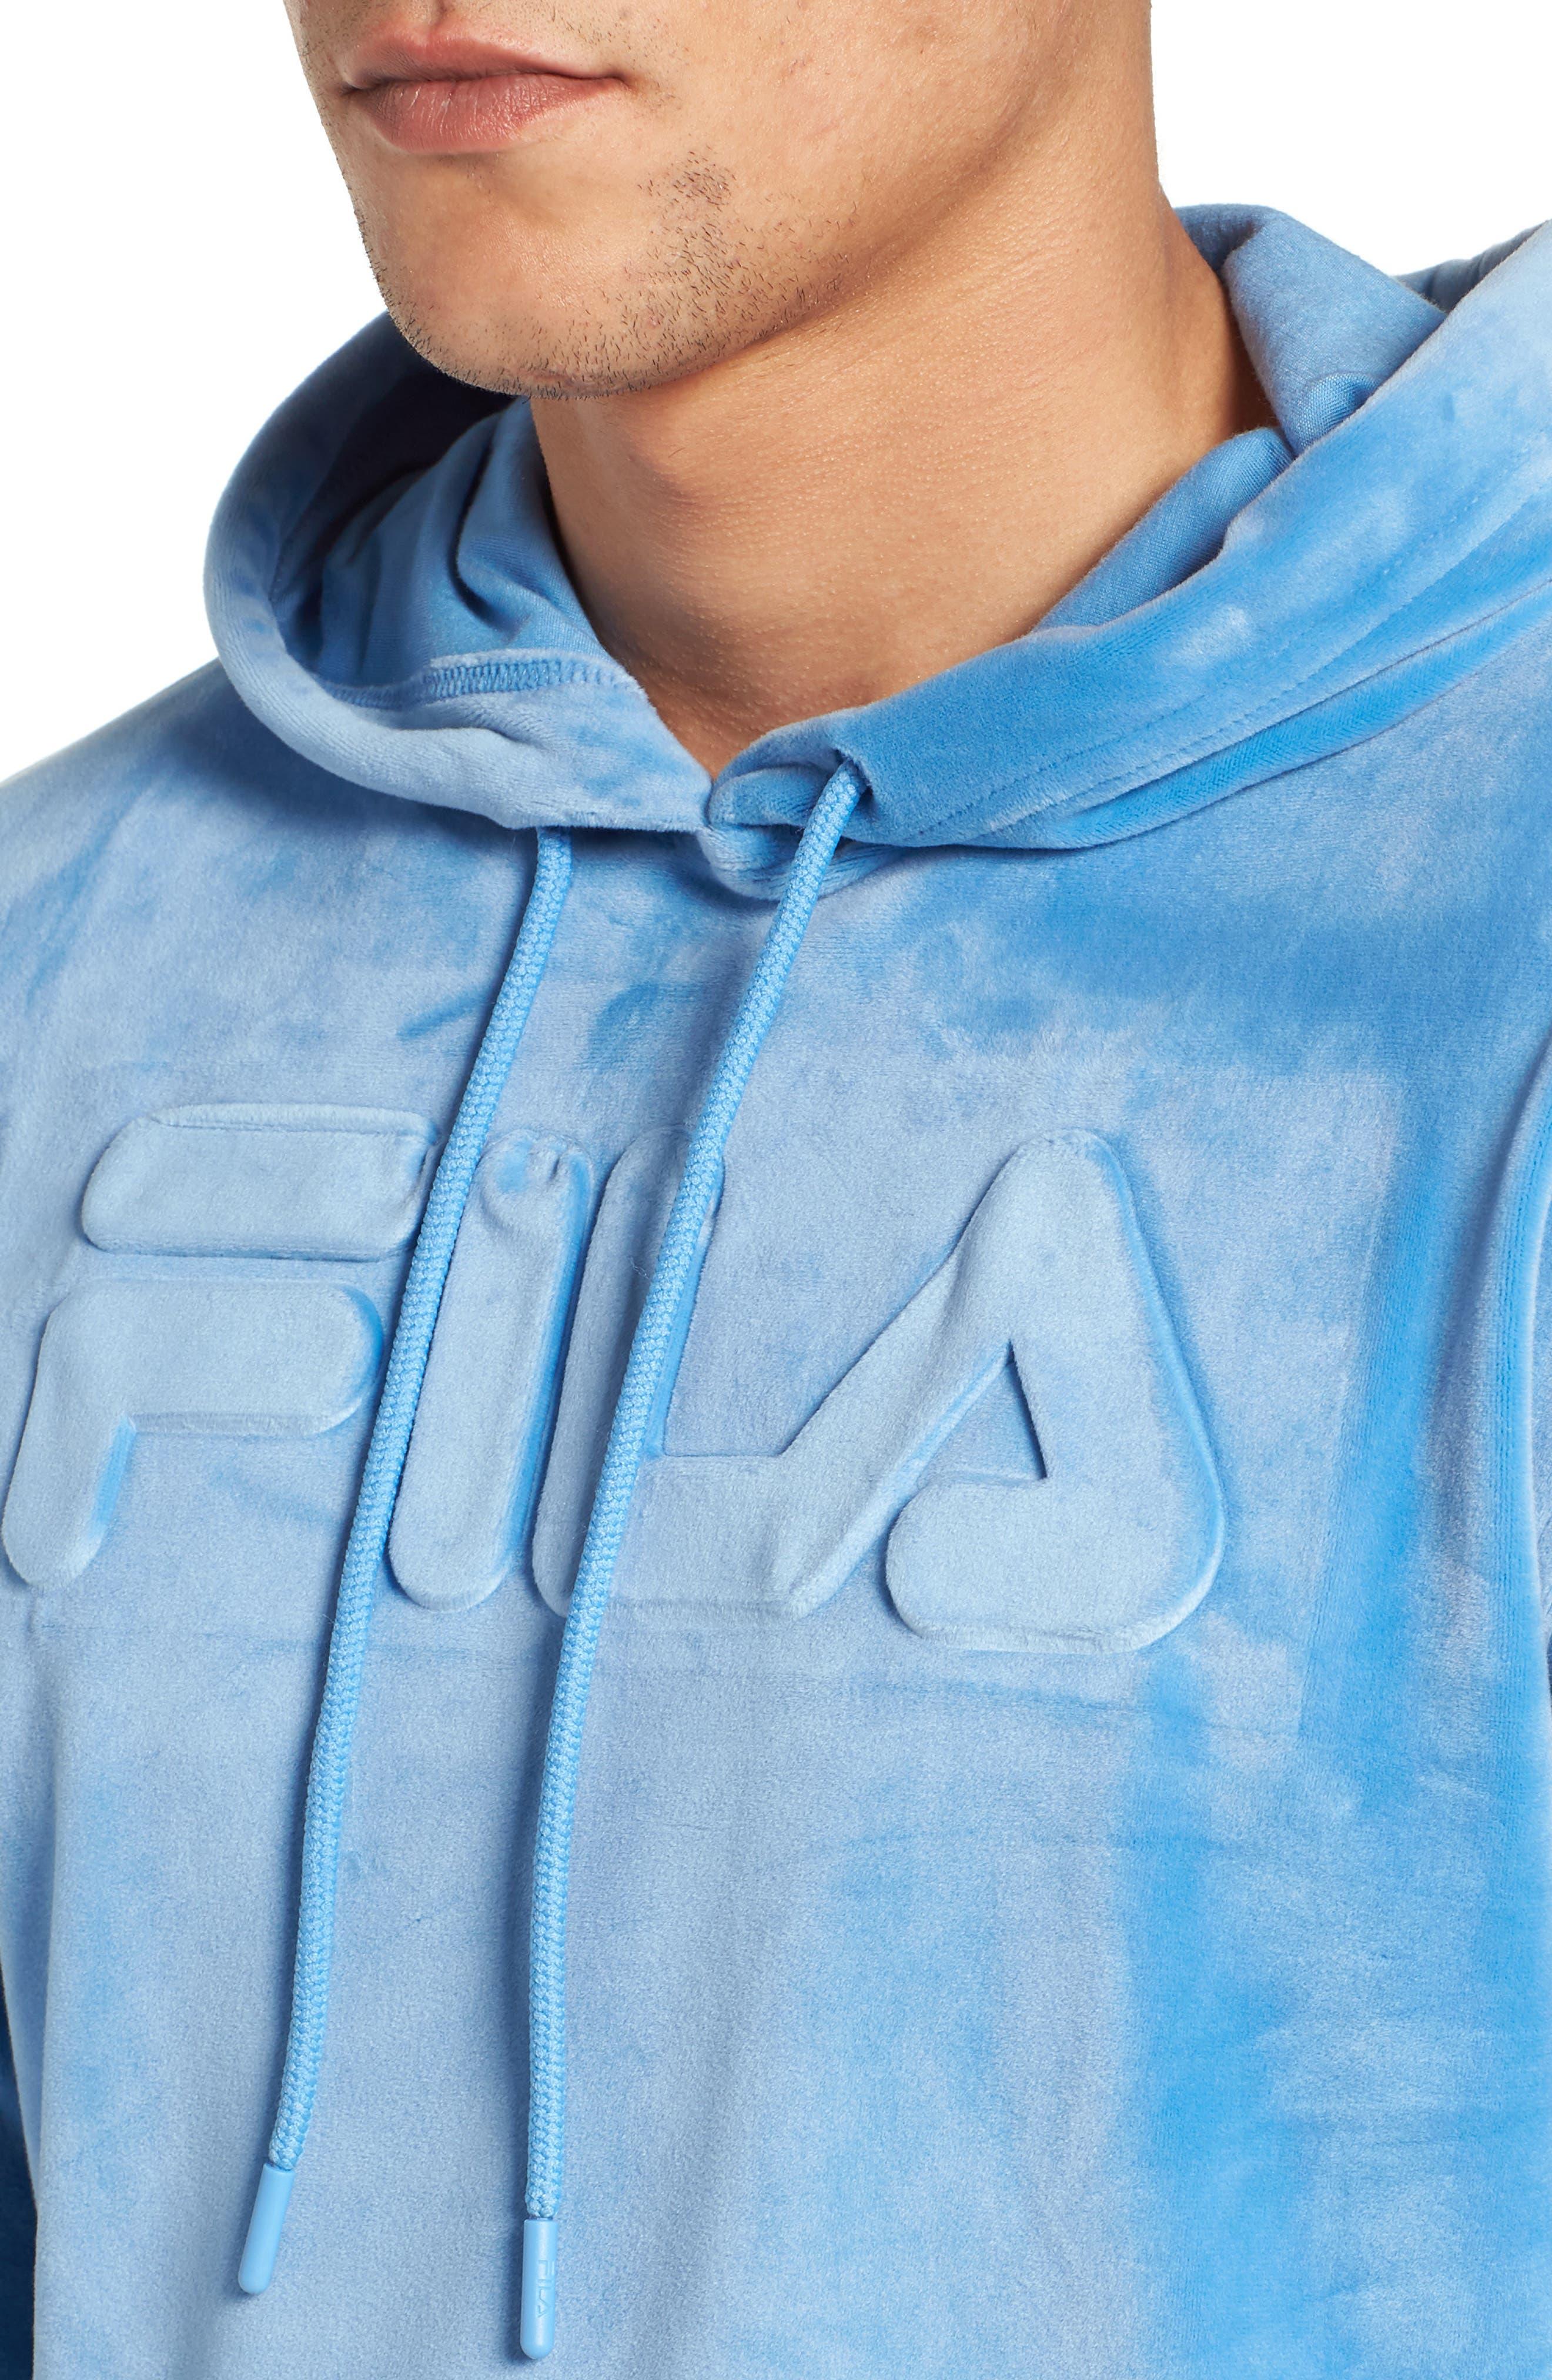 Asher Velour Hoodie Sweatshirt,                             Alternate thumbnail 4, color,                             Silver Lake Blue